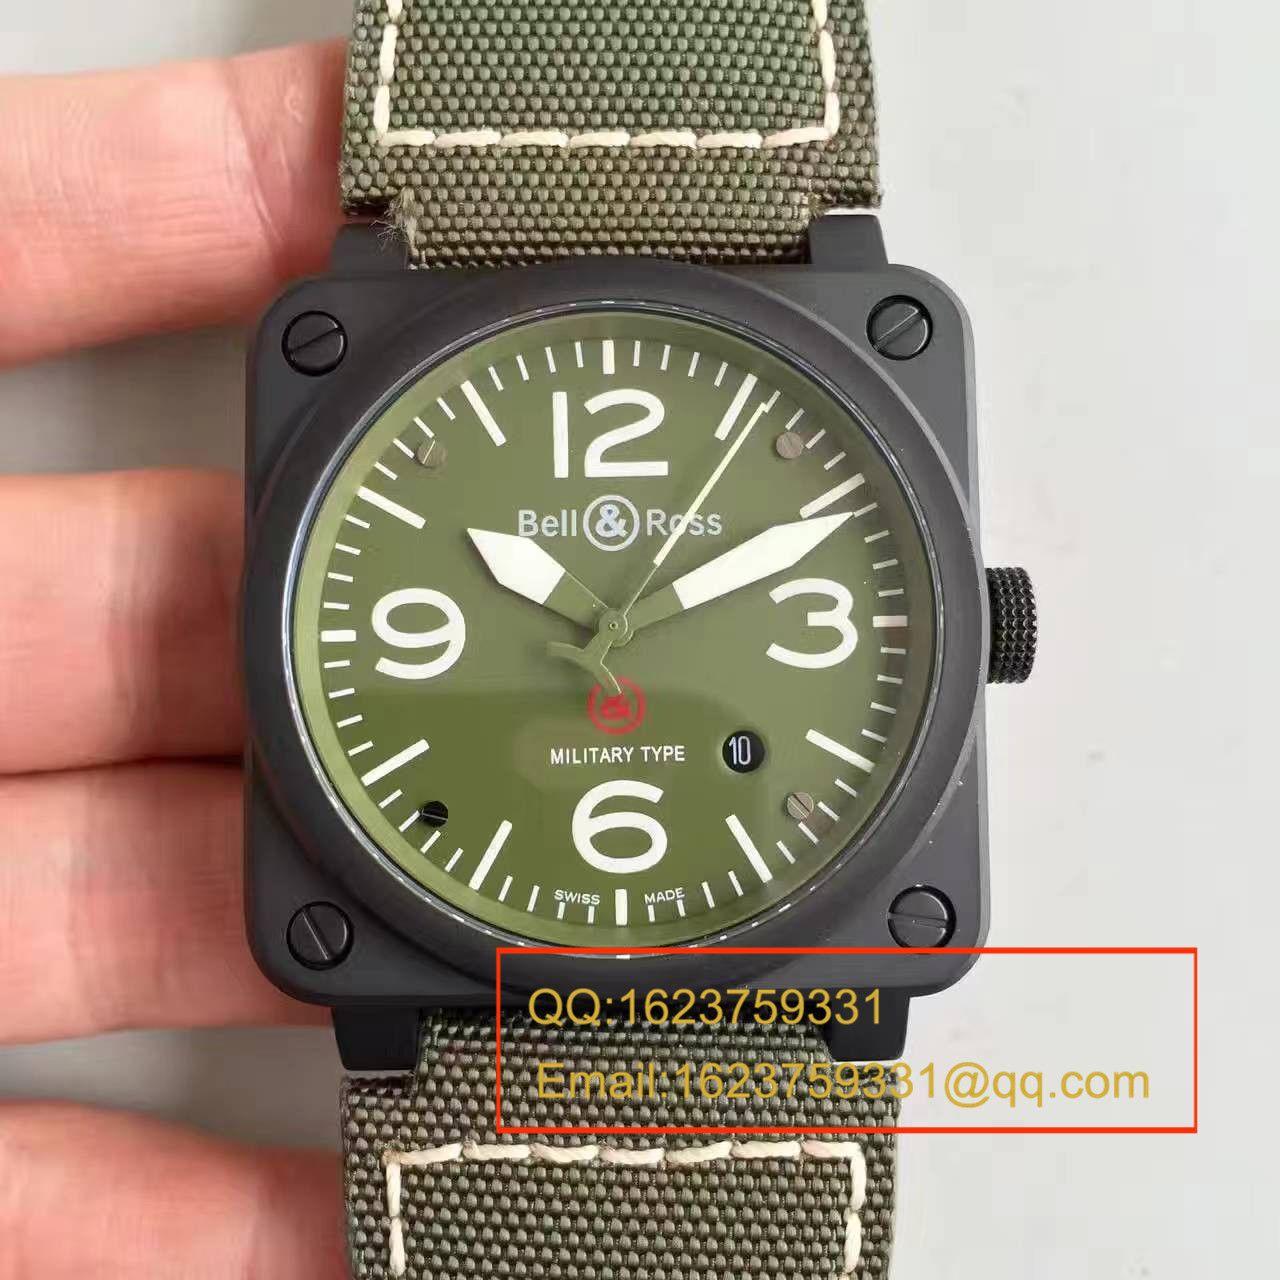 【BR厂顶级复刻高仿手表】柏莱士AVIATION系列BR 03-92 Military Carbon腕表 / BLS007